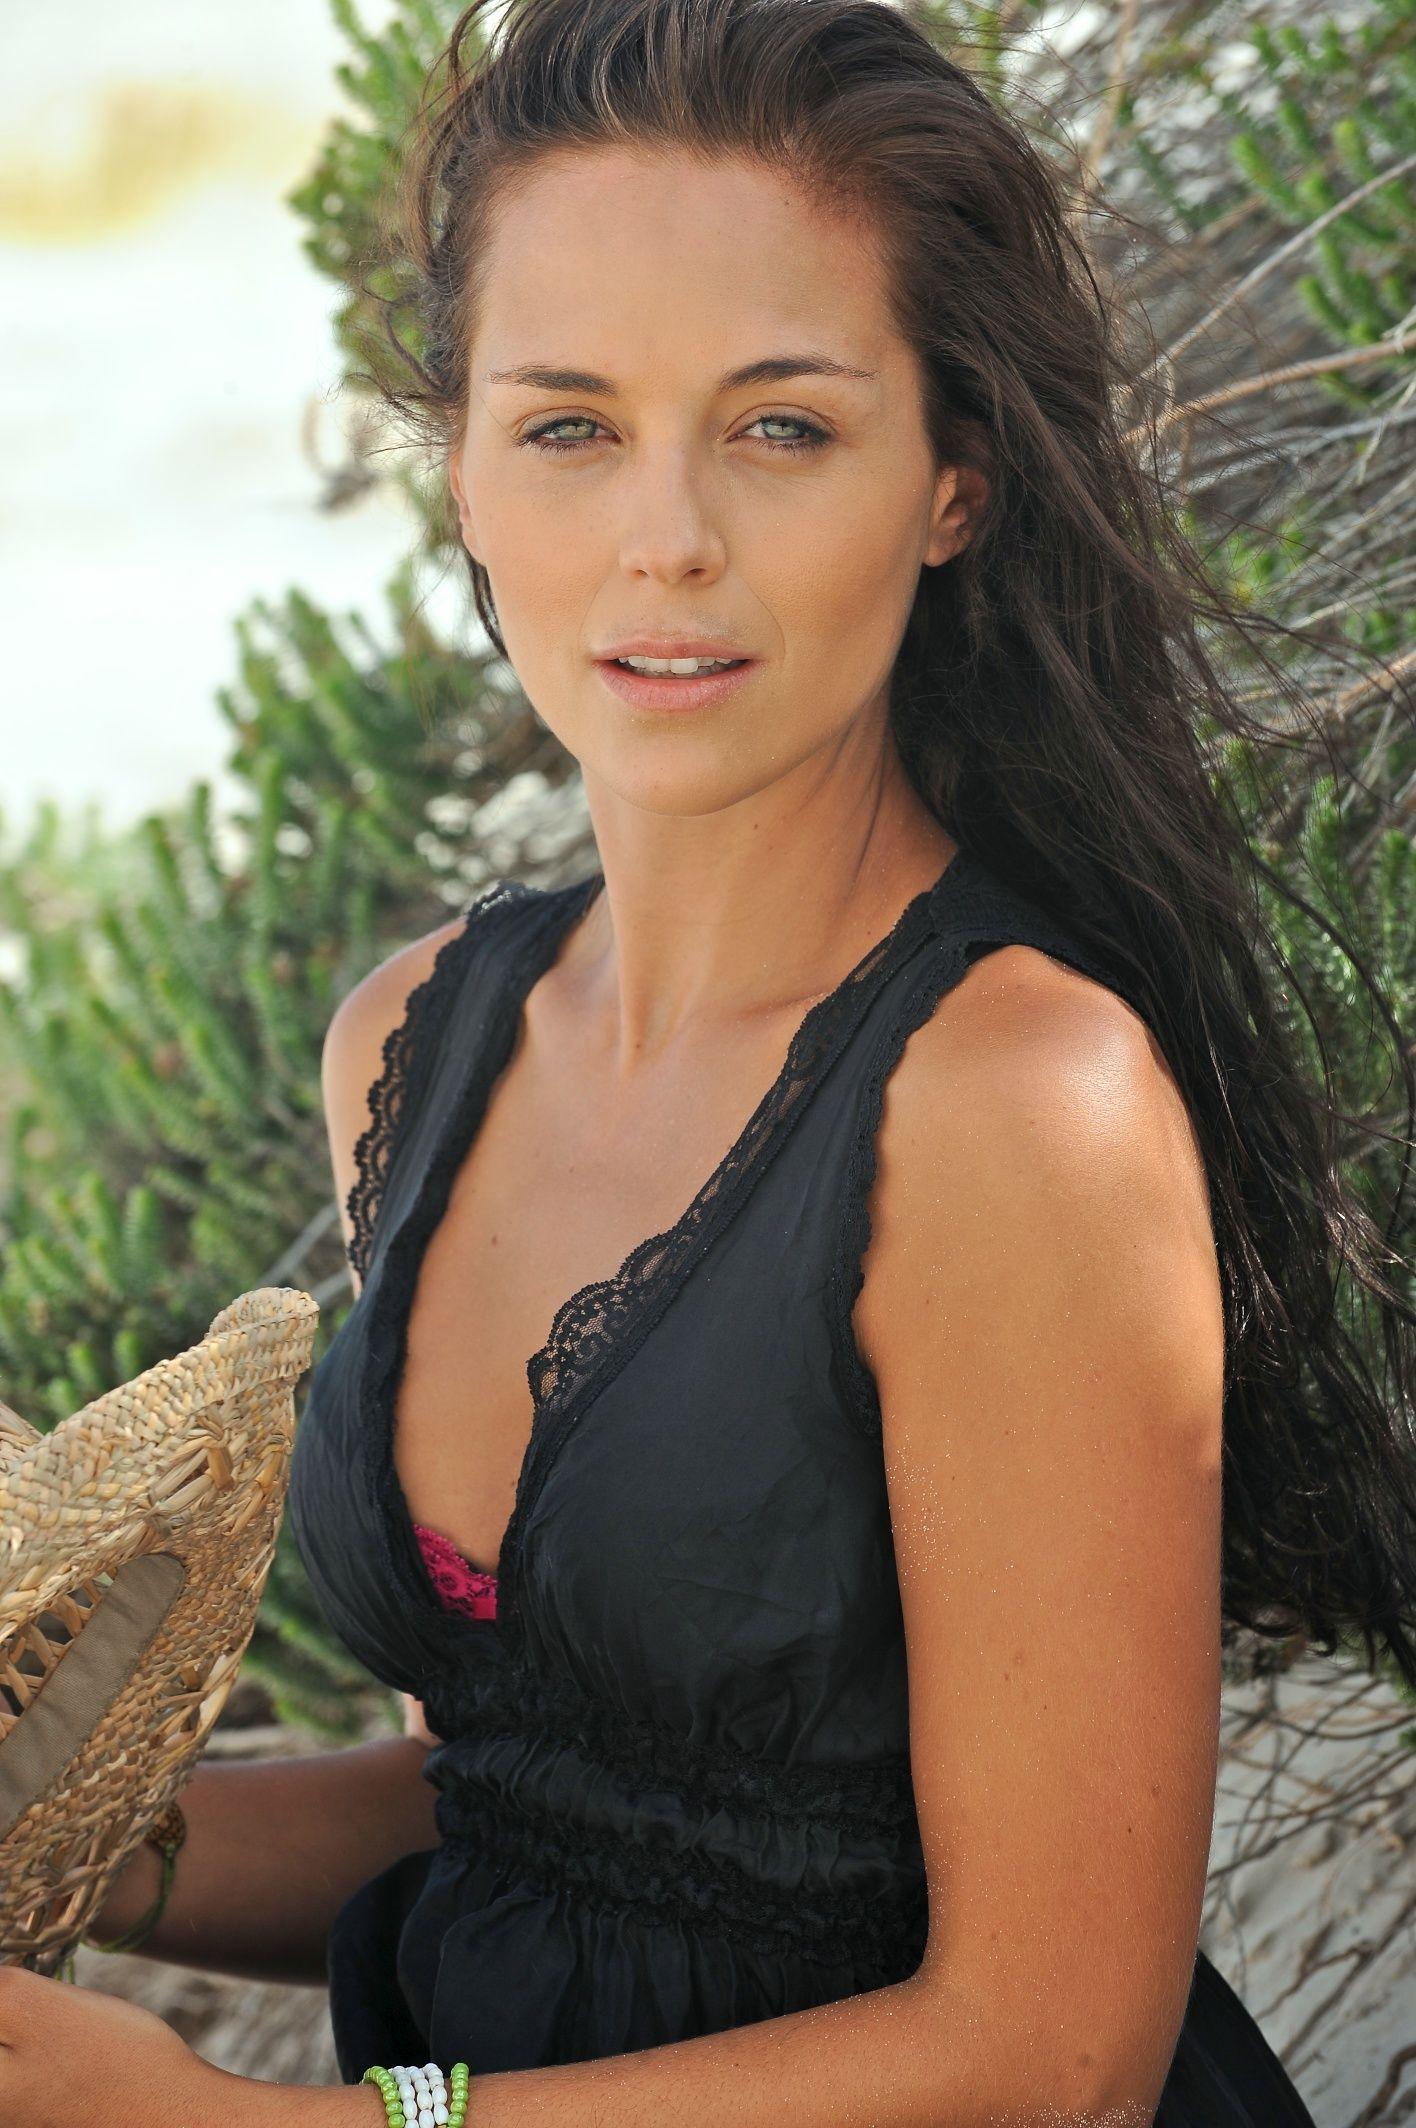 Celebrites Tanya van Graan nudes (76 photos), Twitter